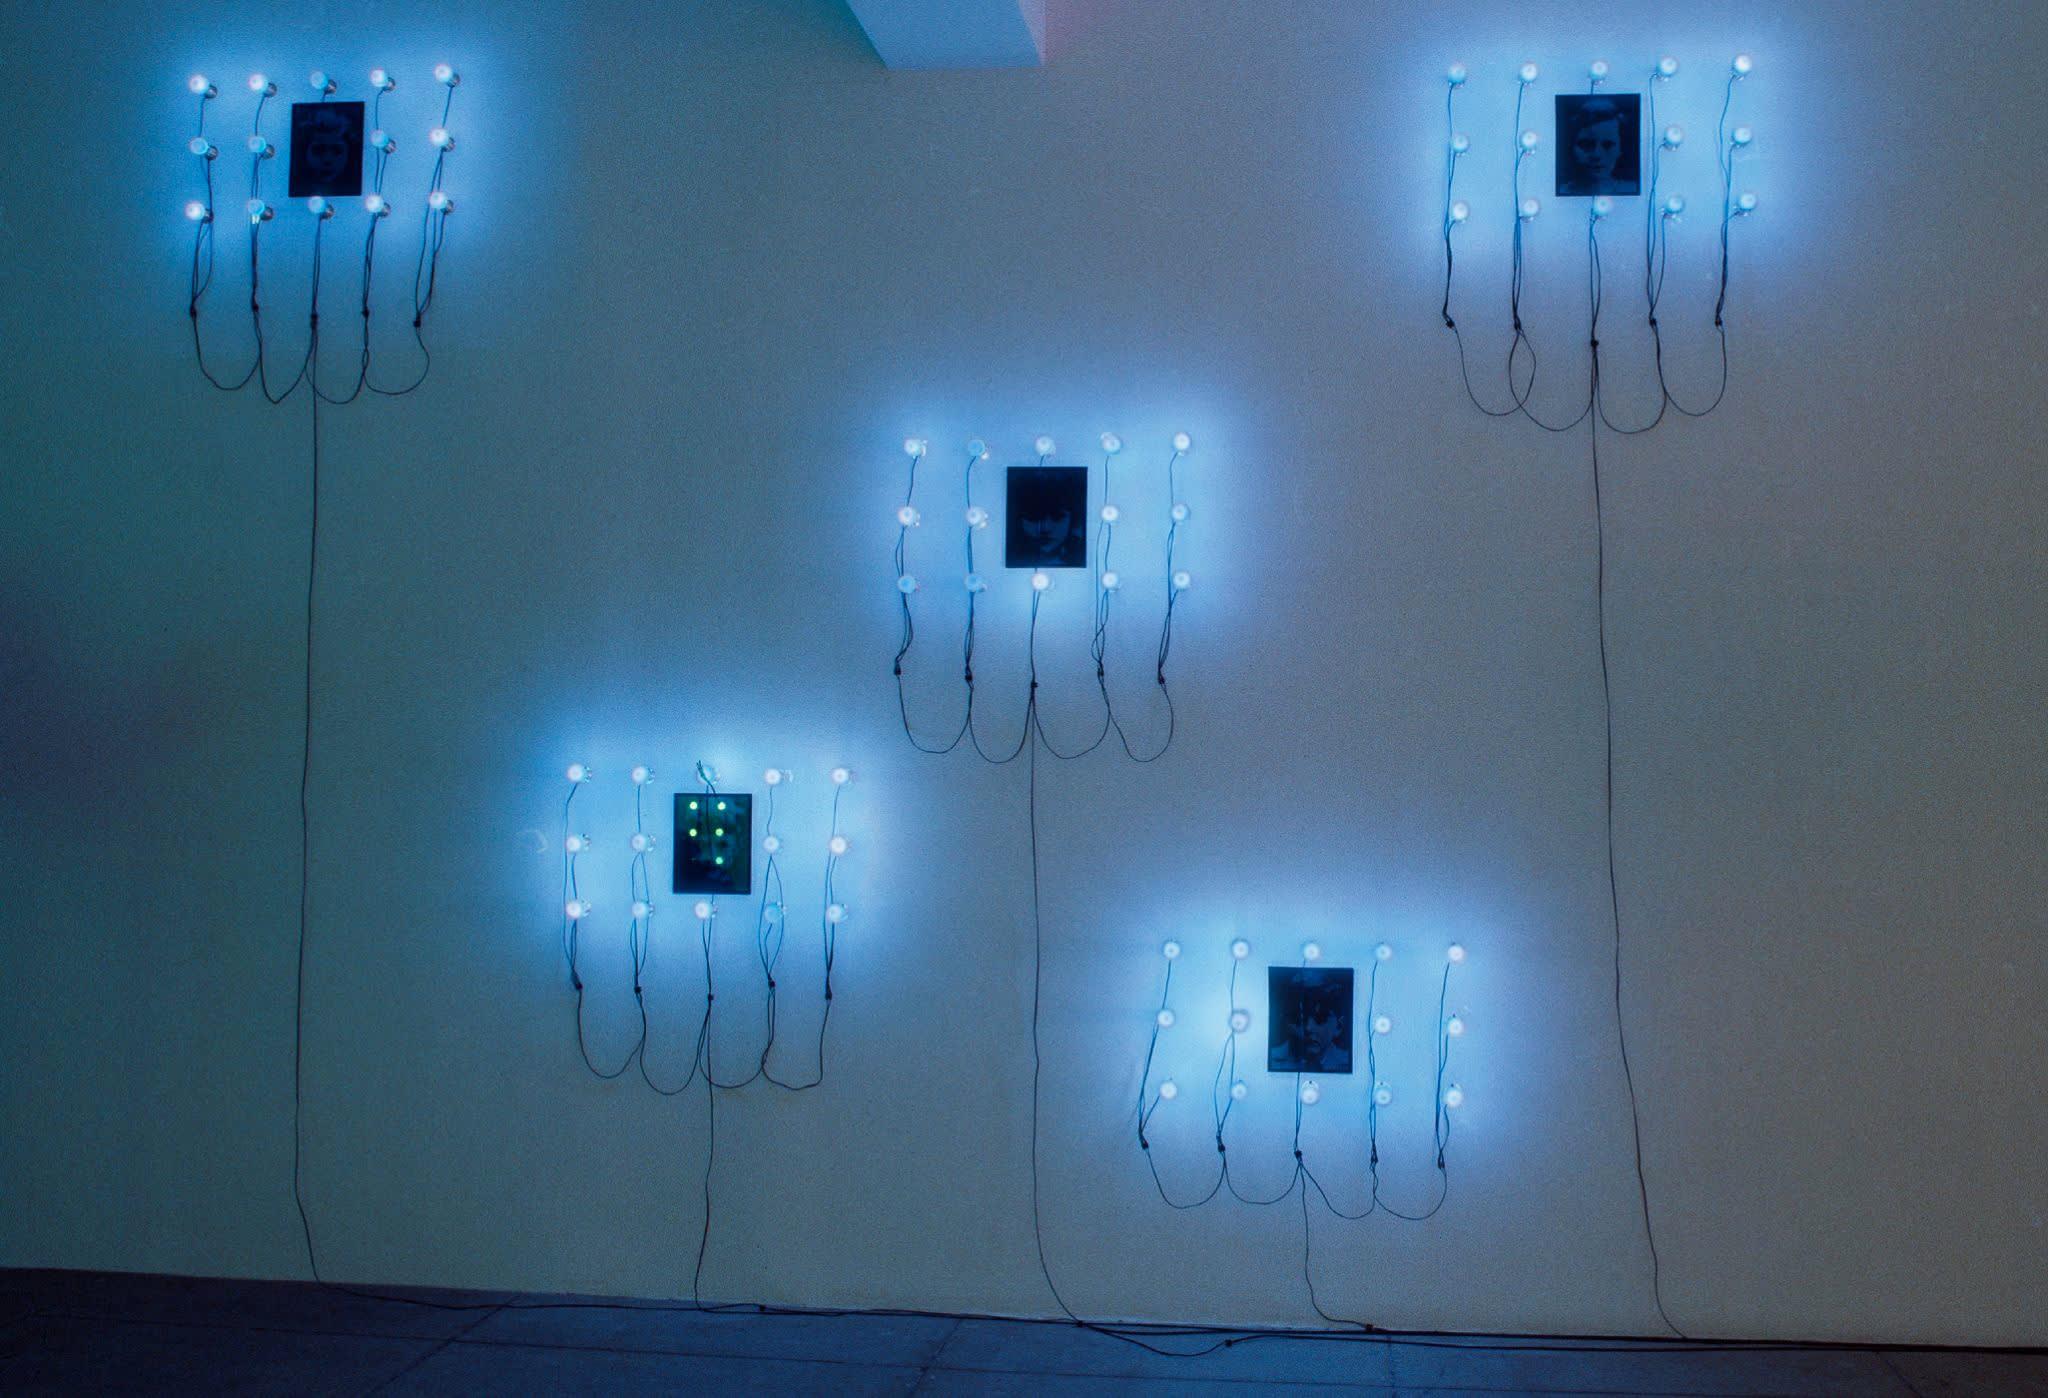 Christian Boltanski, Lumieres (Pierre, Henri, Florence, Jeannette, Marie), 2000